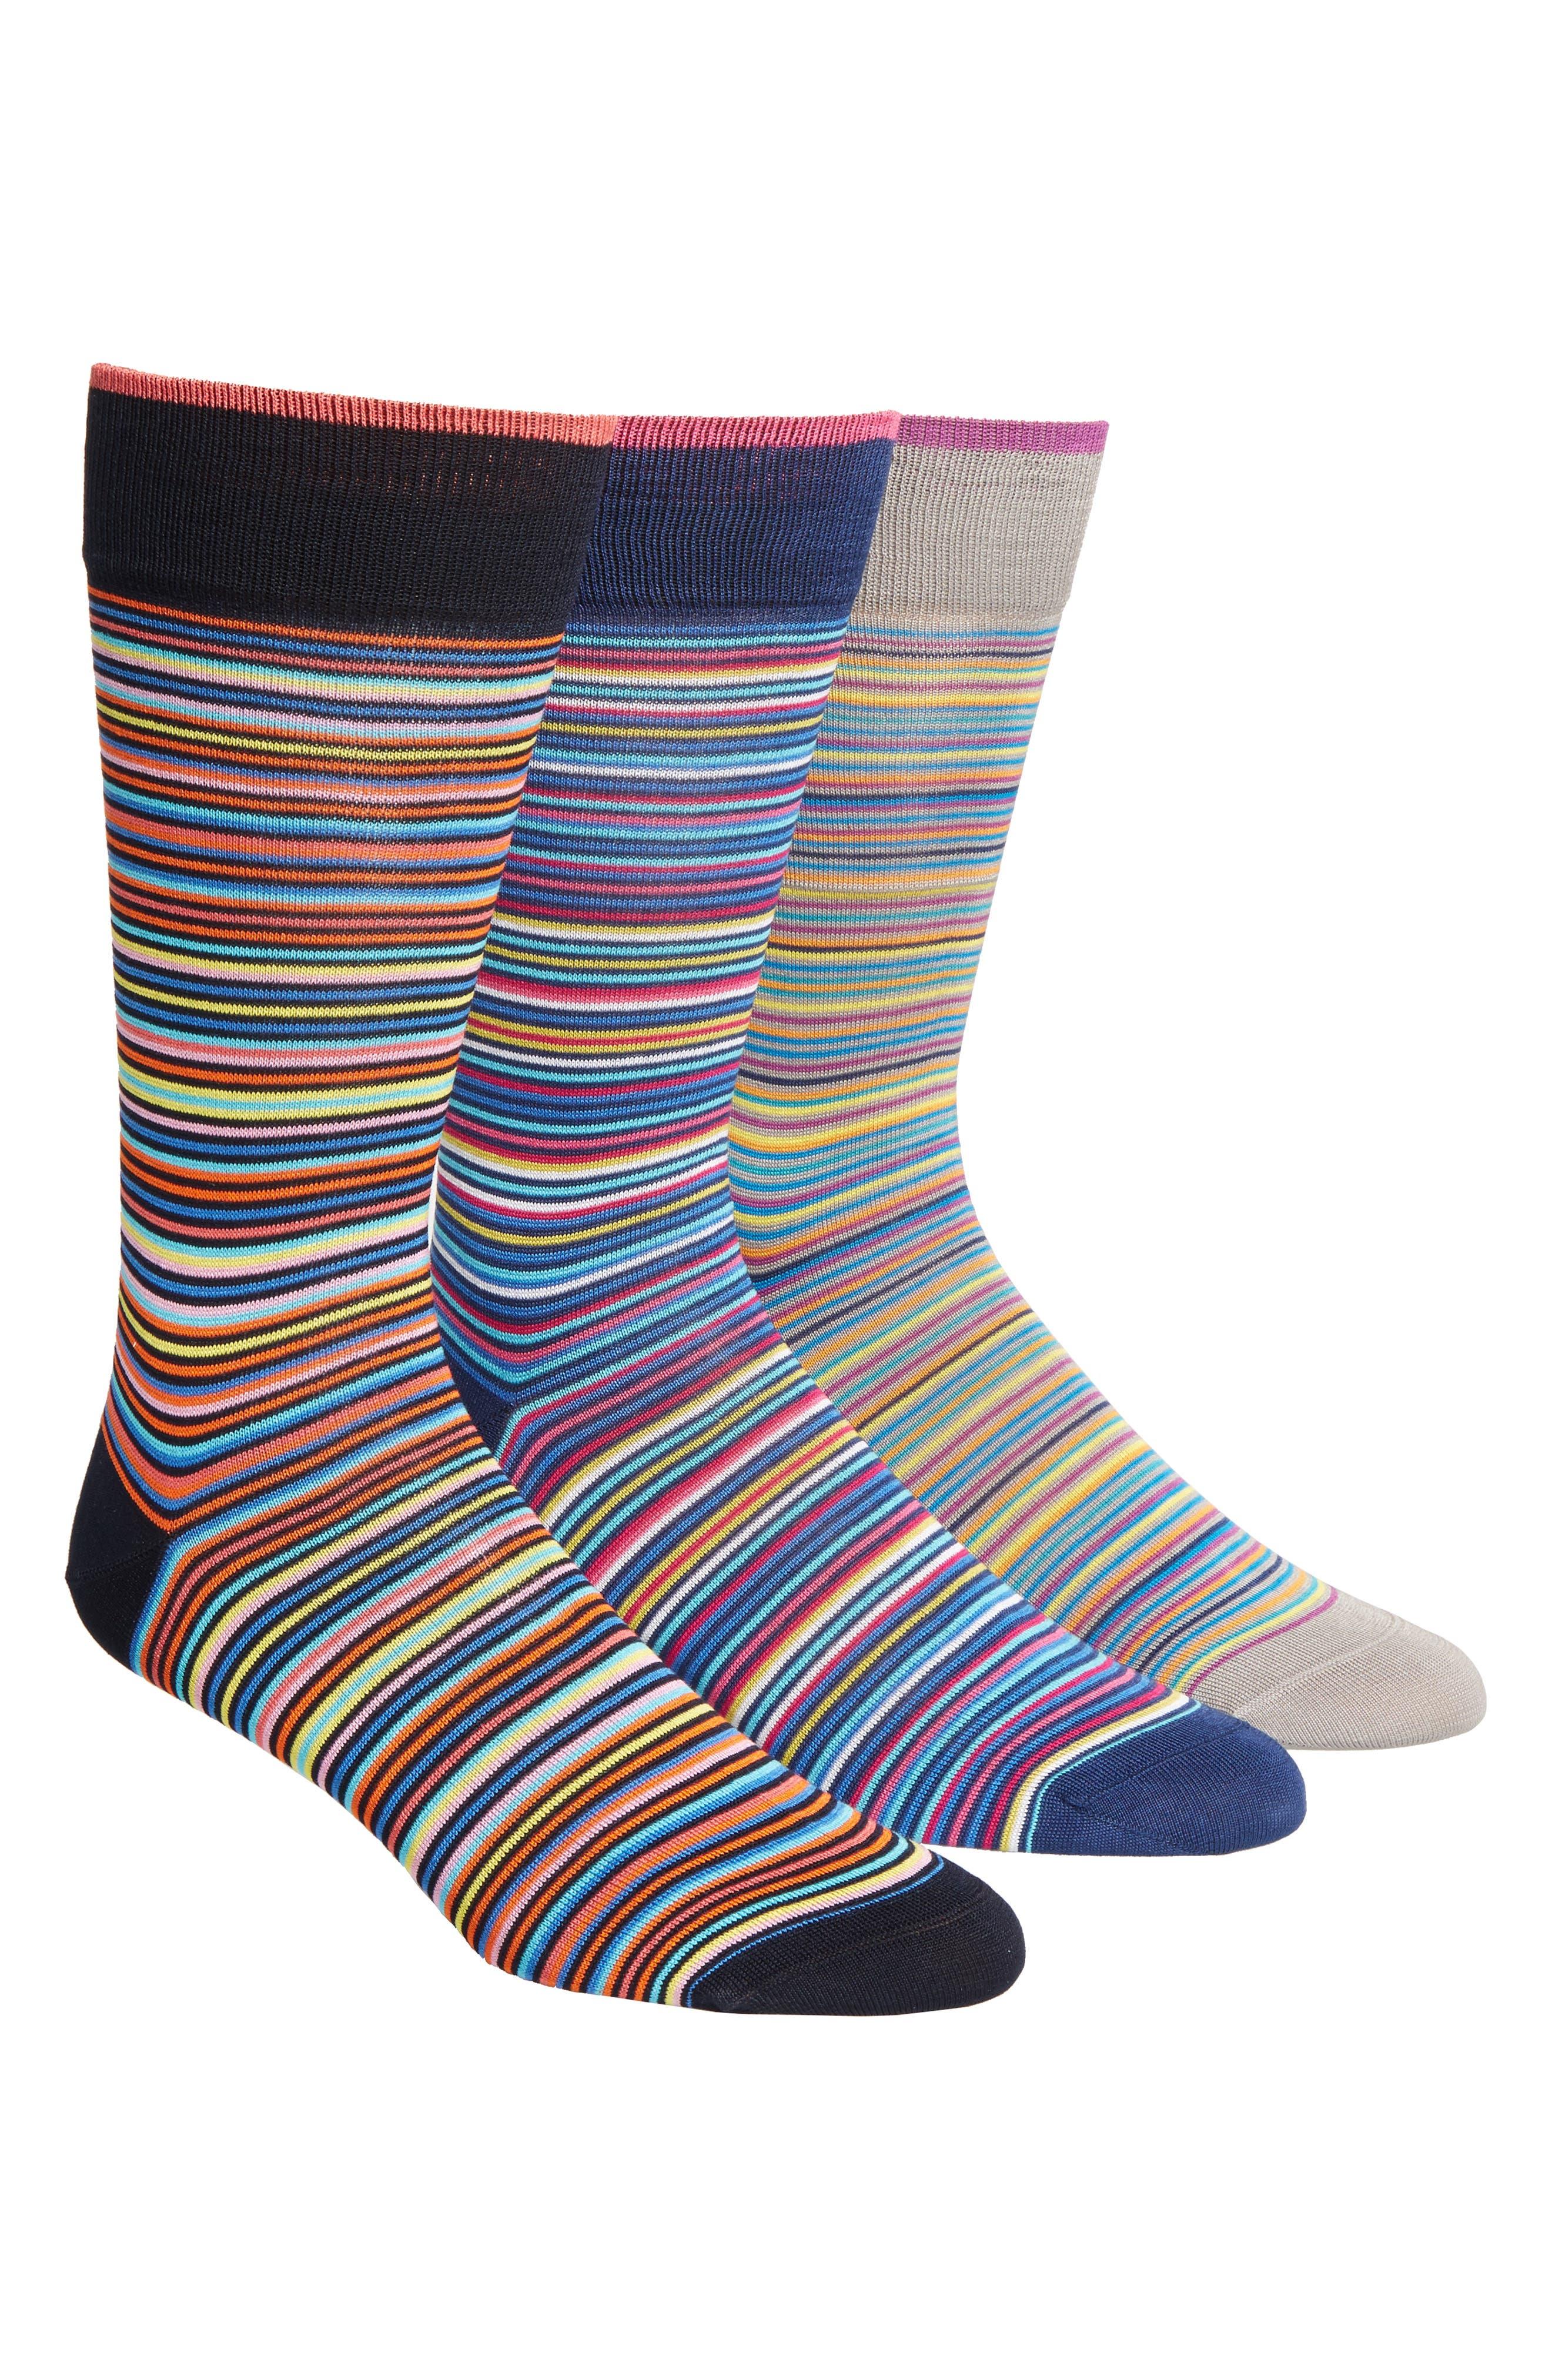 3-Pack Cotton Blend Socks,                             Main thumbnail 1, color,                             015